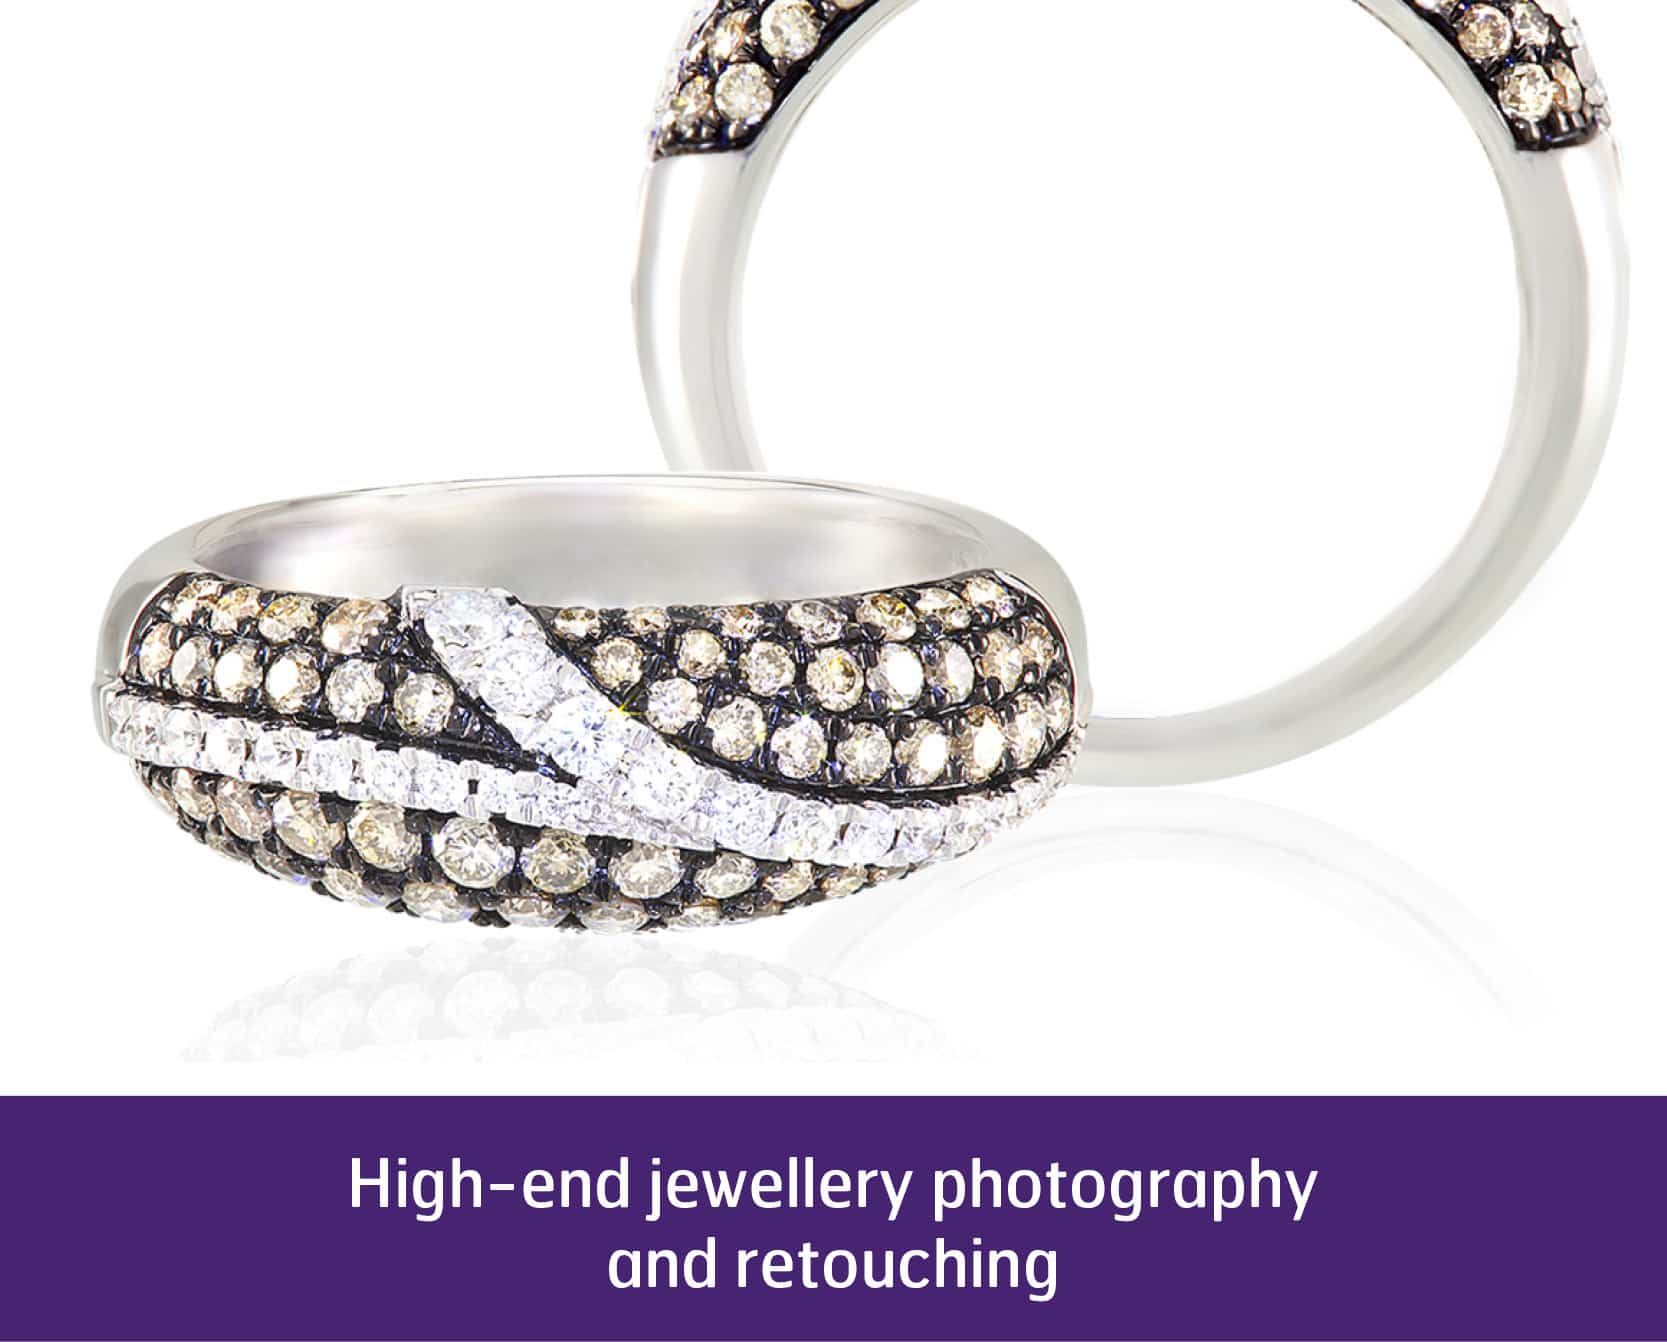 Professional image of diamond ring